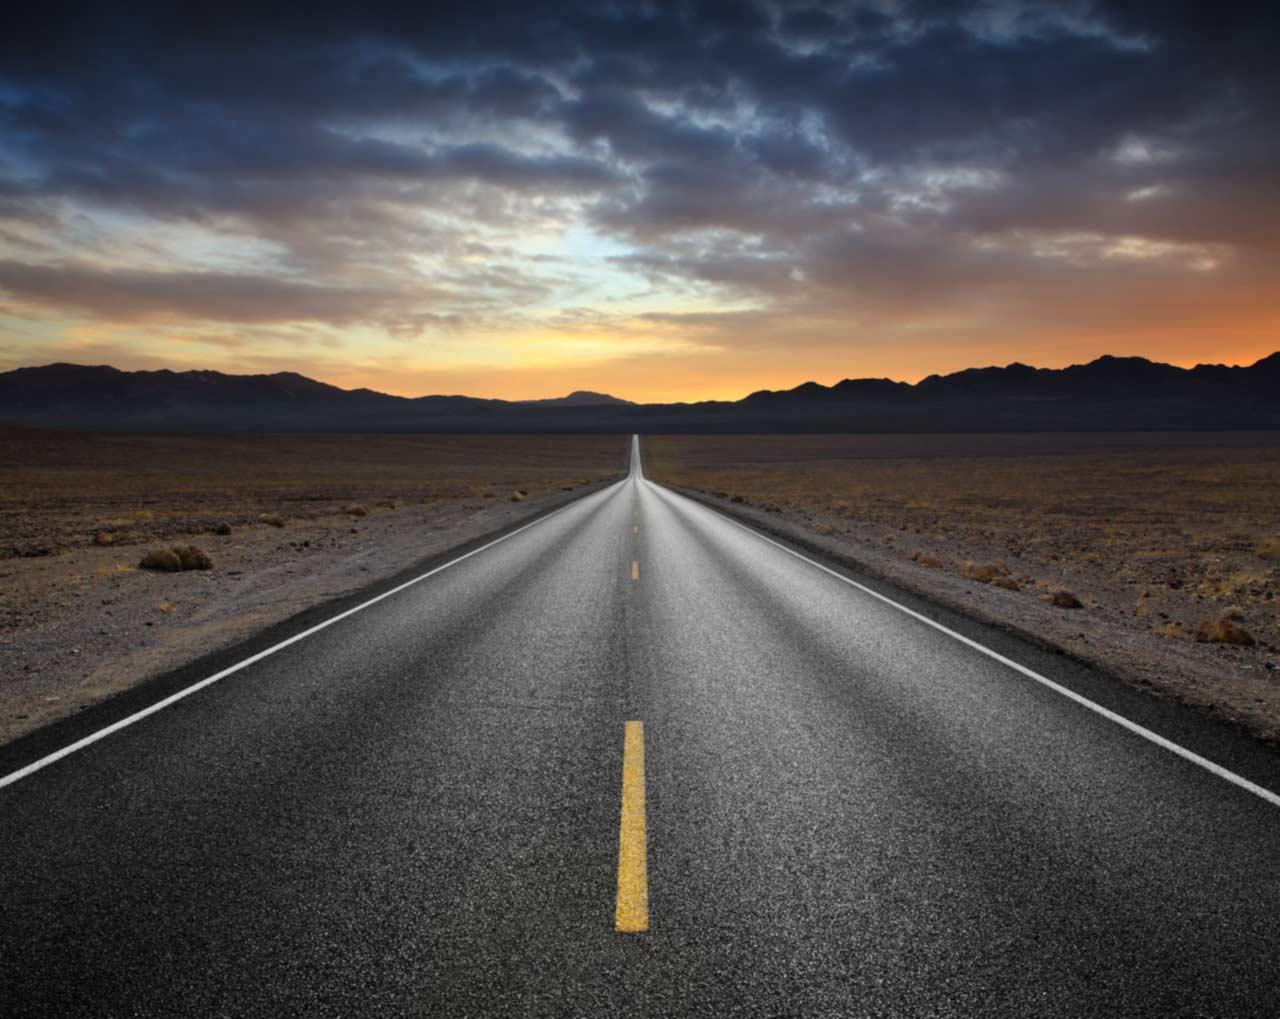 the road goes on kou s wonderland 楽天ブログ